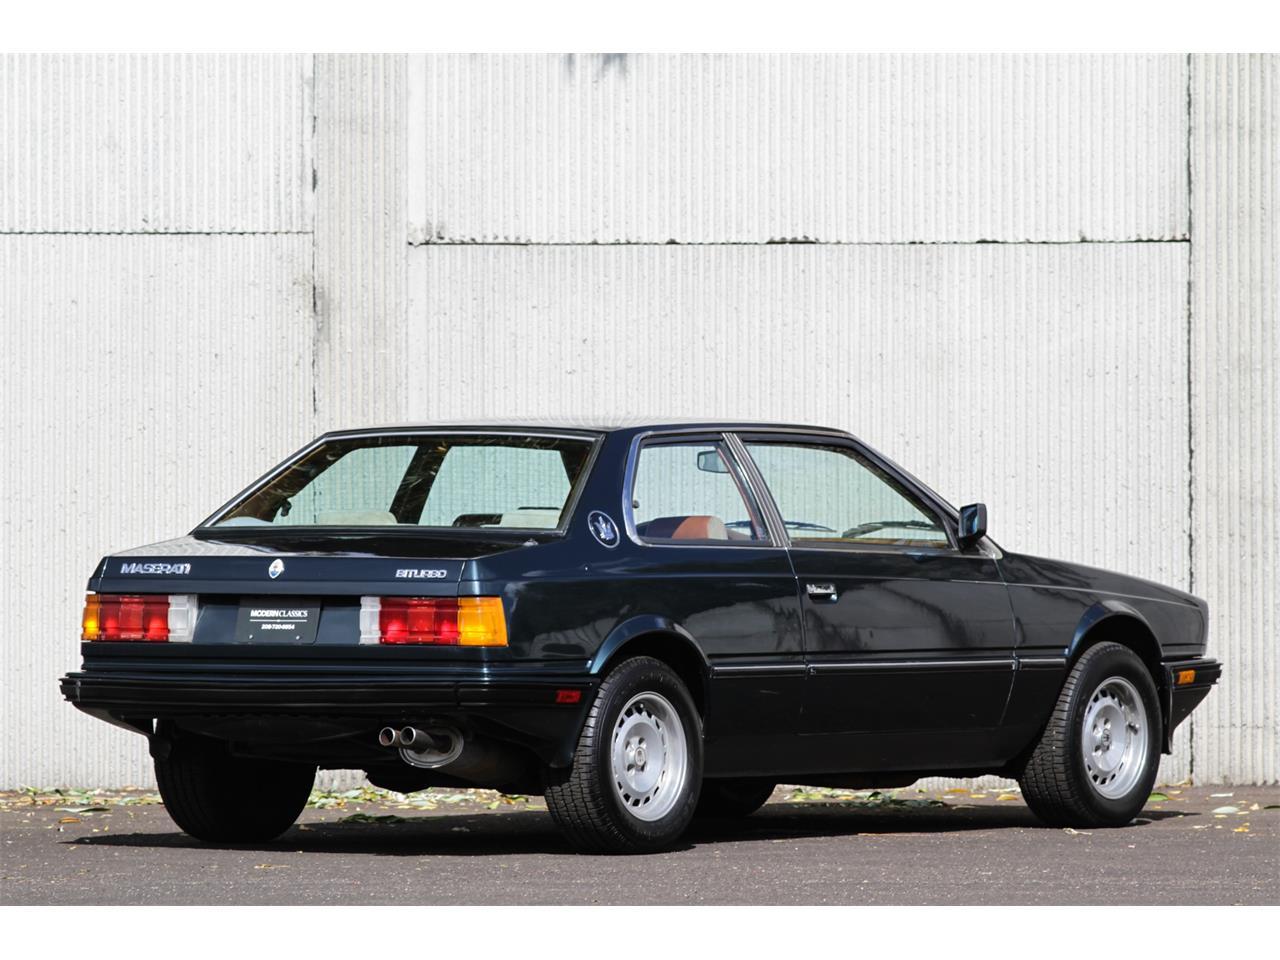 Large Picture of 1984 Maserati Biturbo located in Idaho - $7,995.00 - MAX4